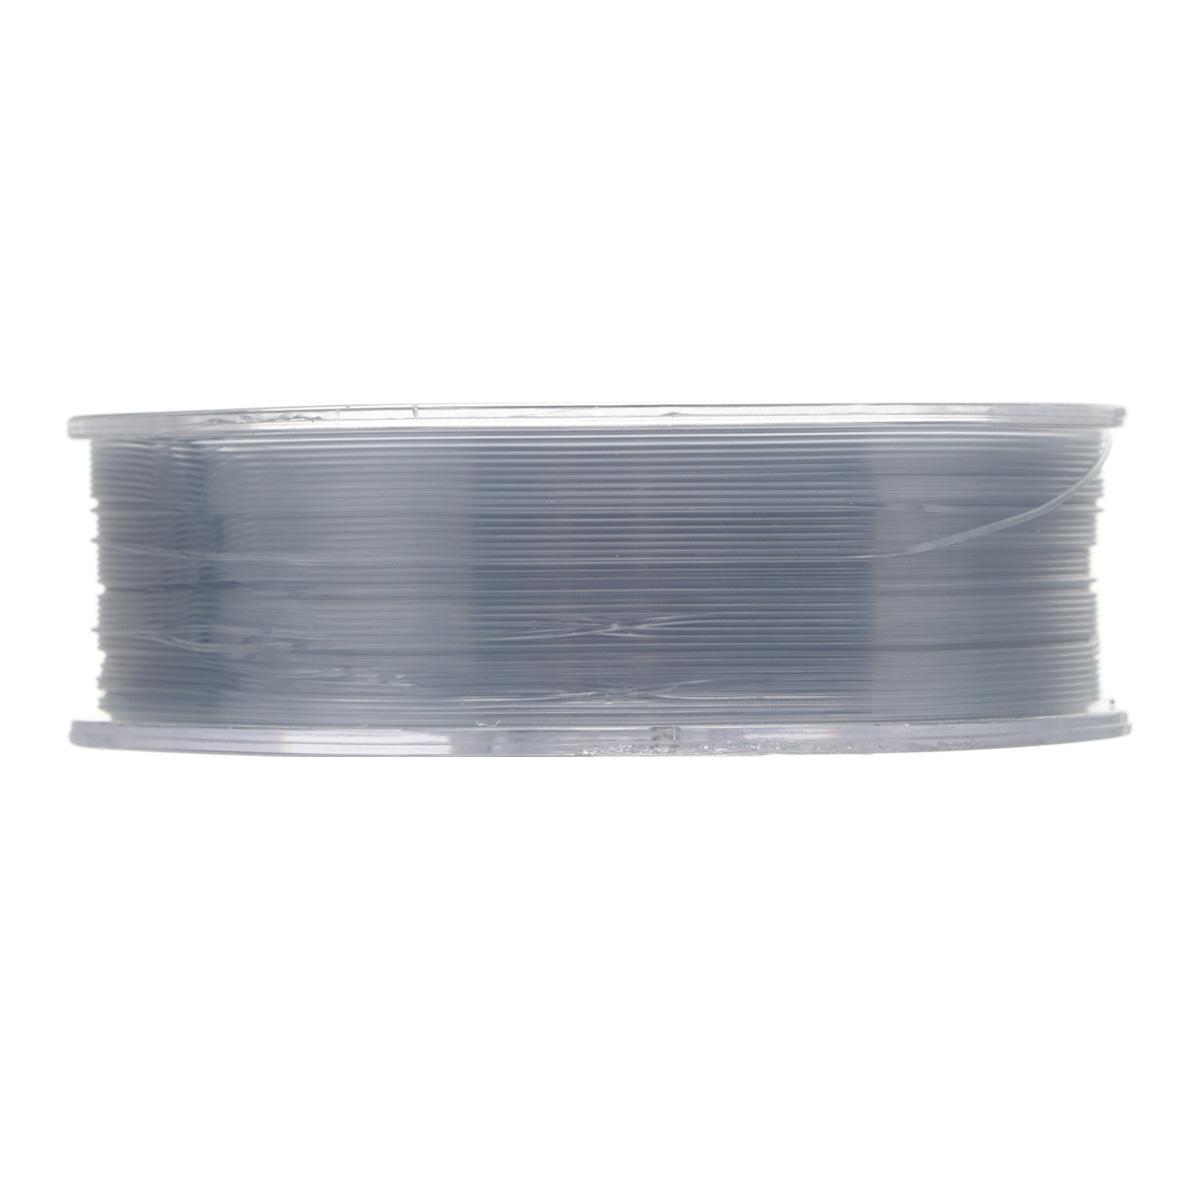 "Леска Allvega ""ZDX Special Spin"", цвет: светло-серый, 100 м, 0,45 мм, 15,4 кг"